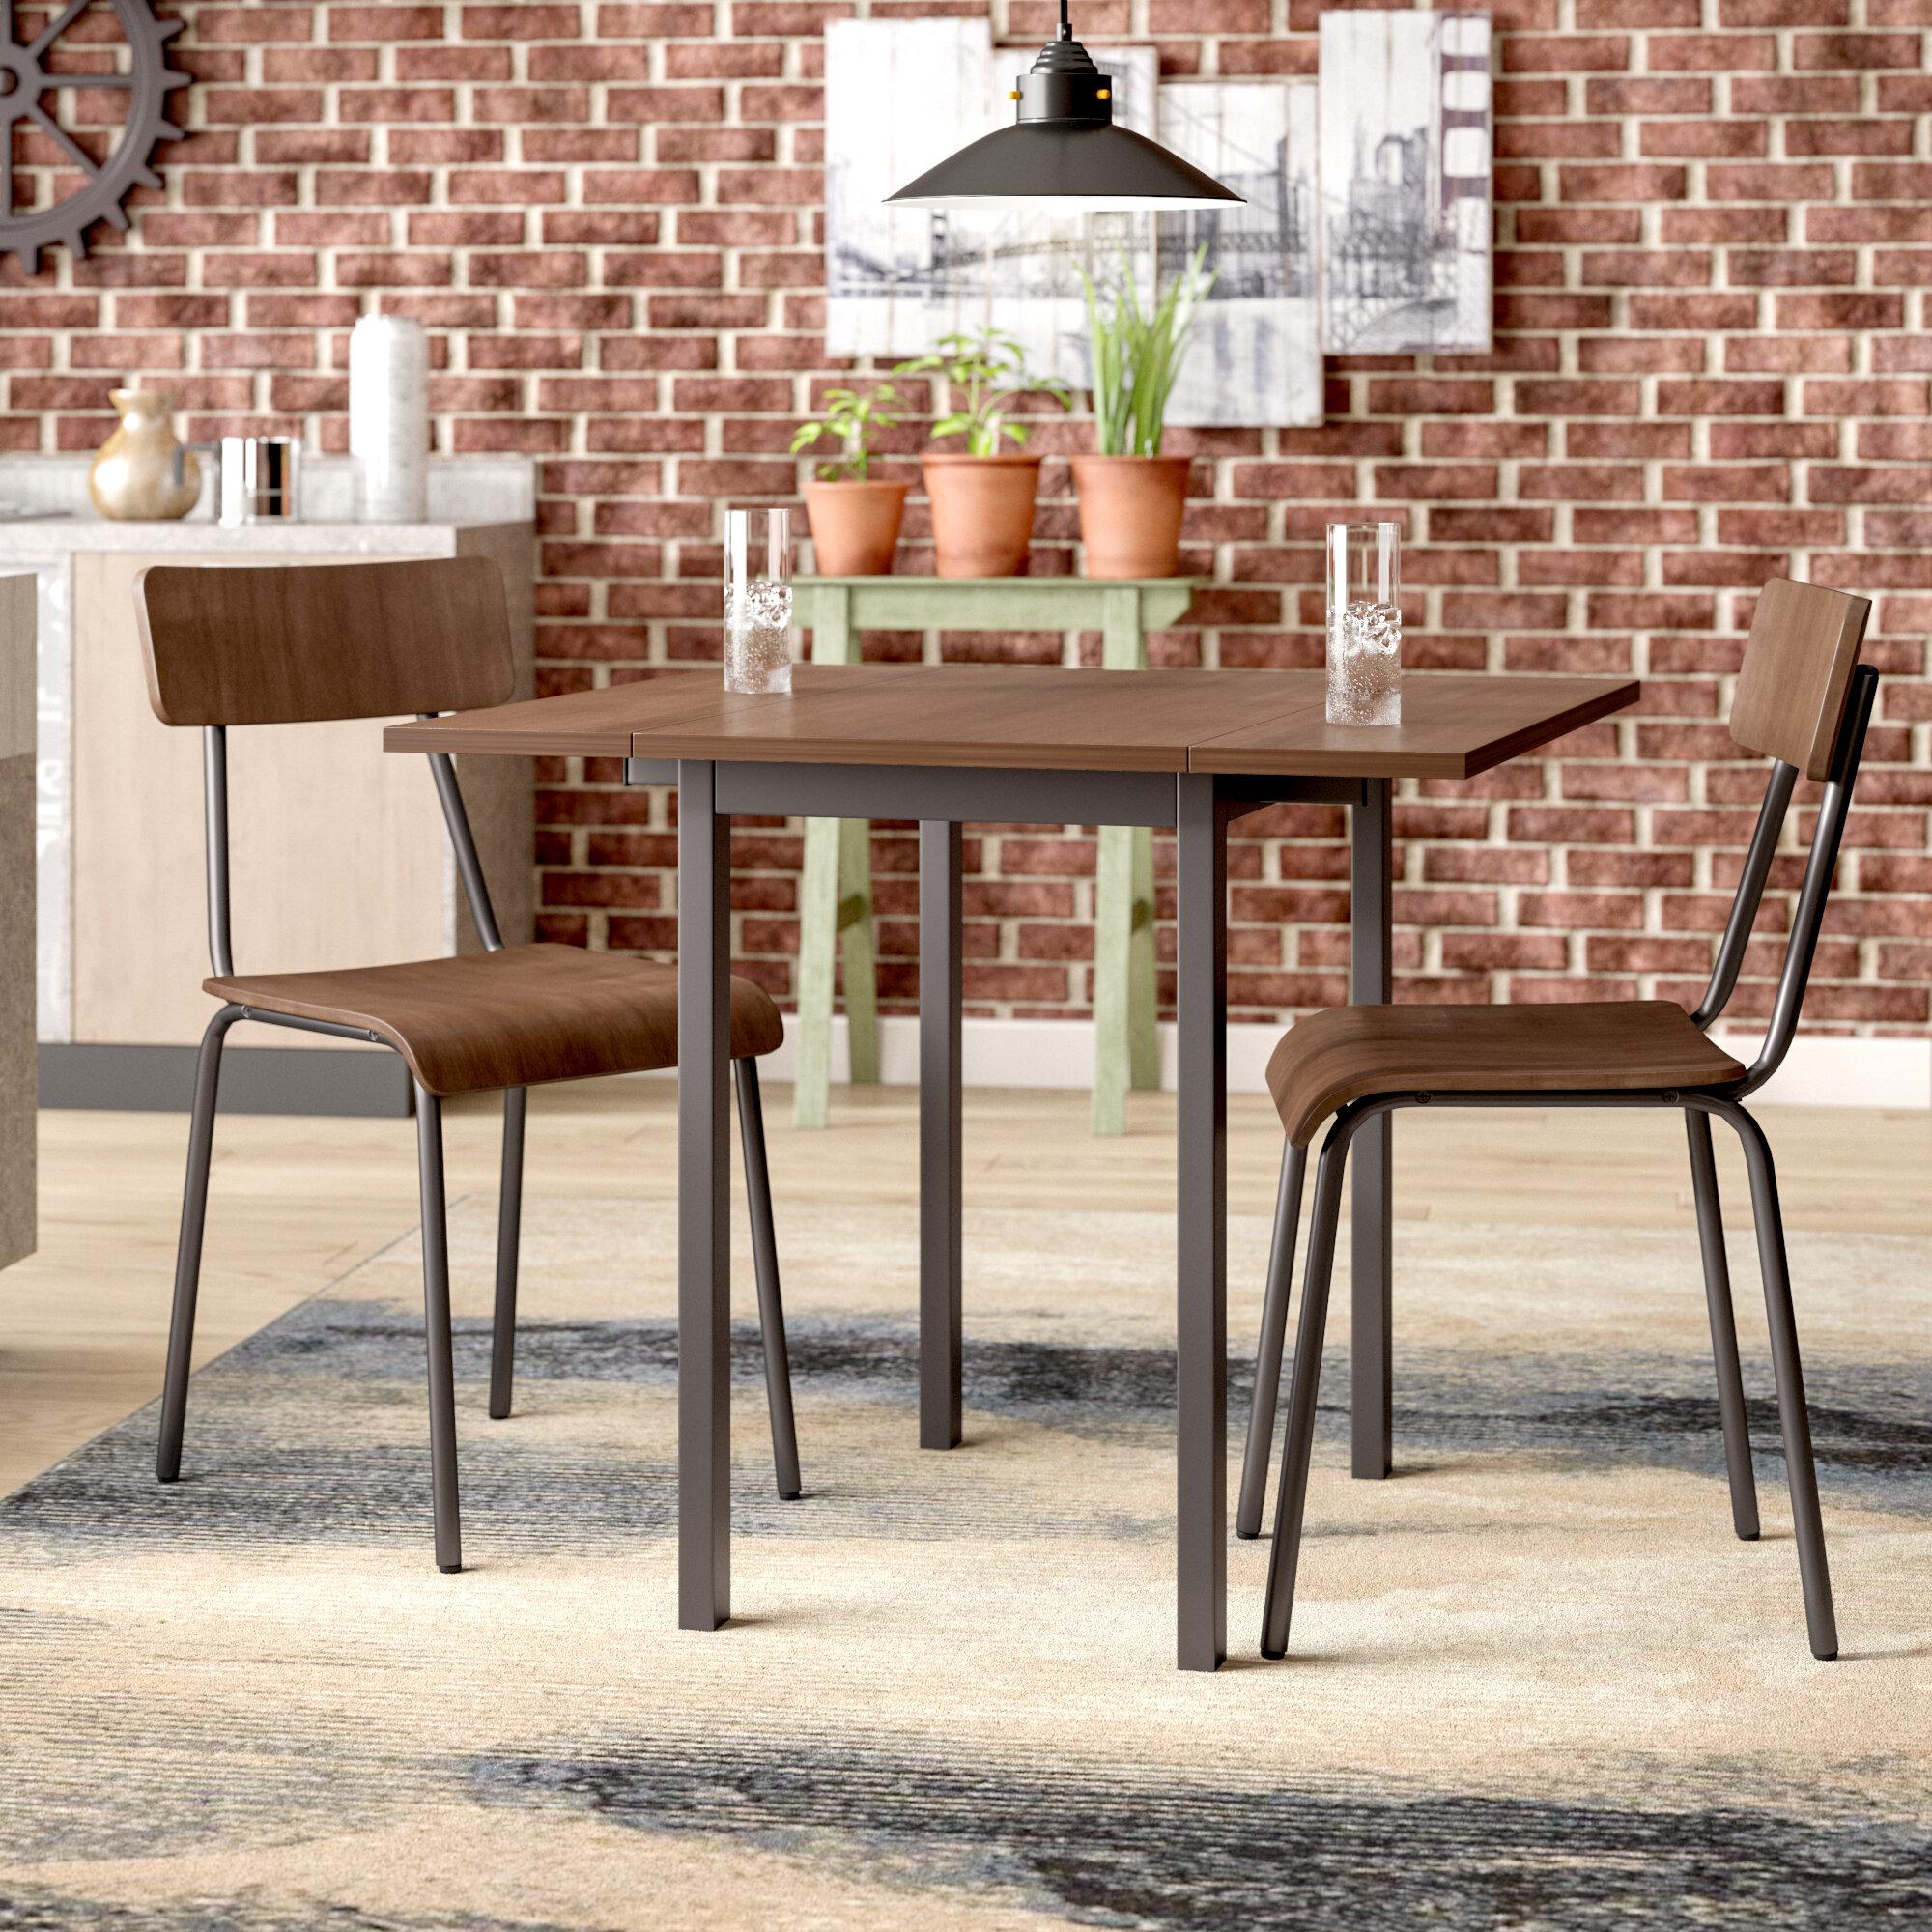 Superbe Araminta Industrial 3 Piece Drop Leaf Solid Wood Dining Set